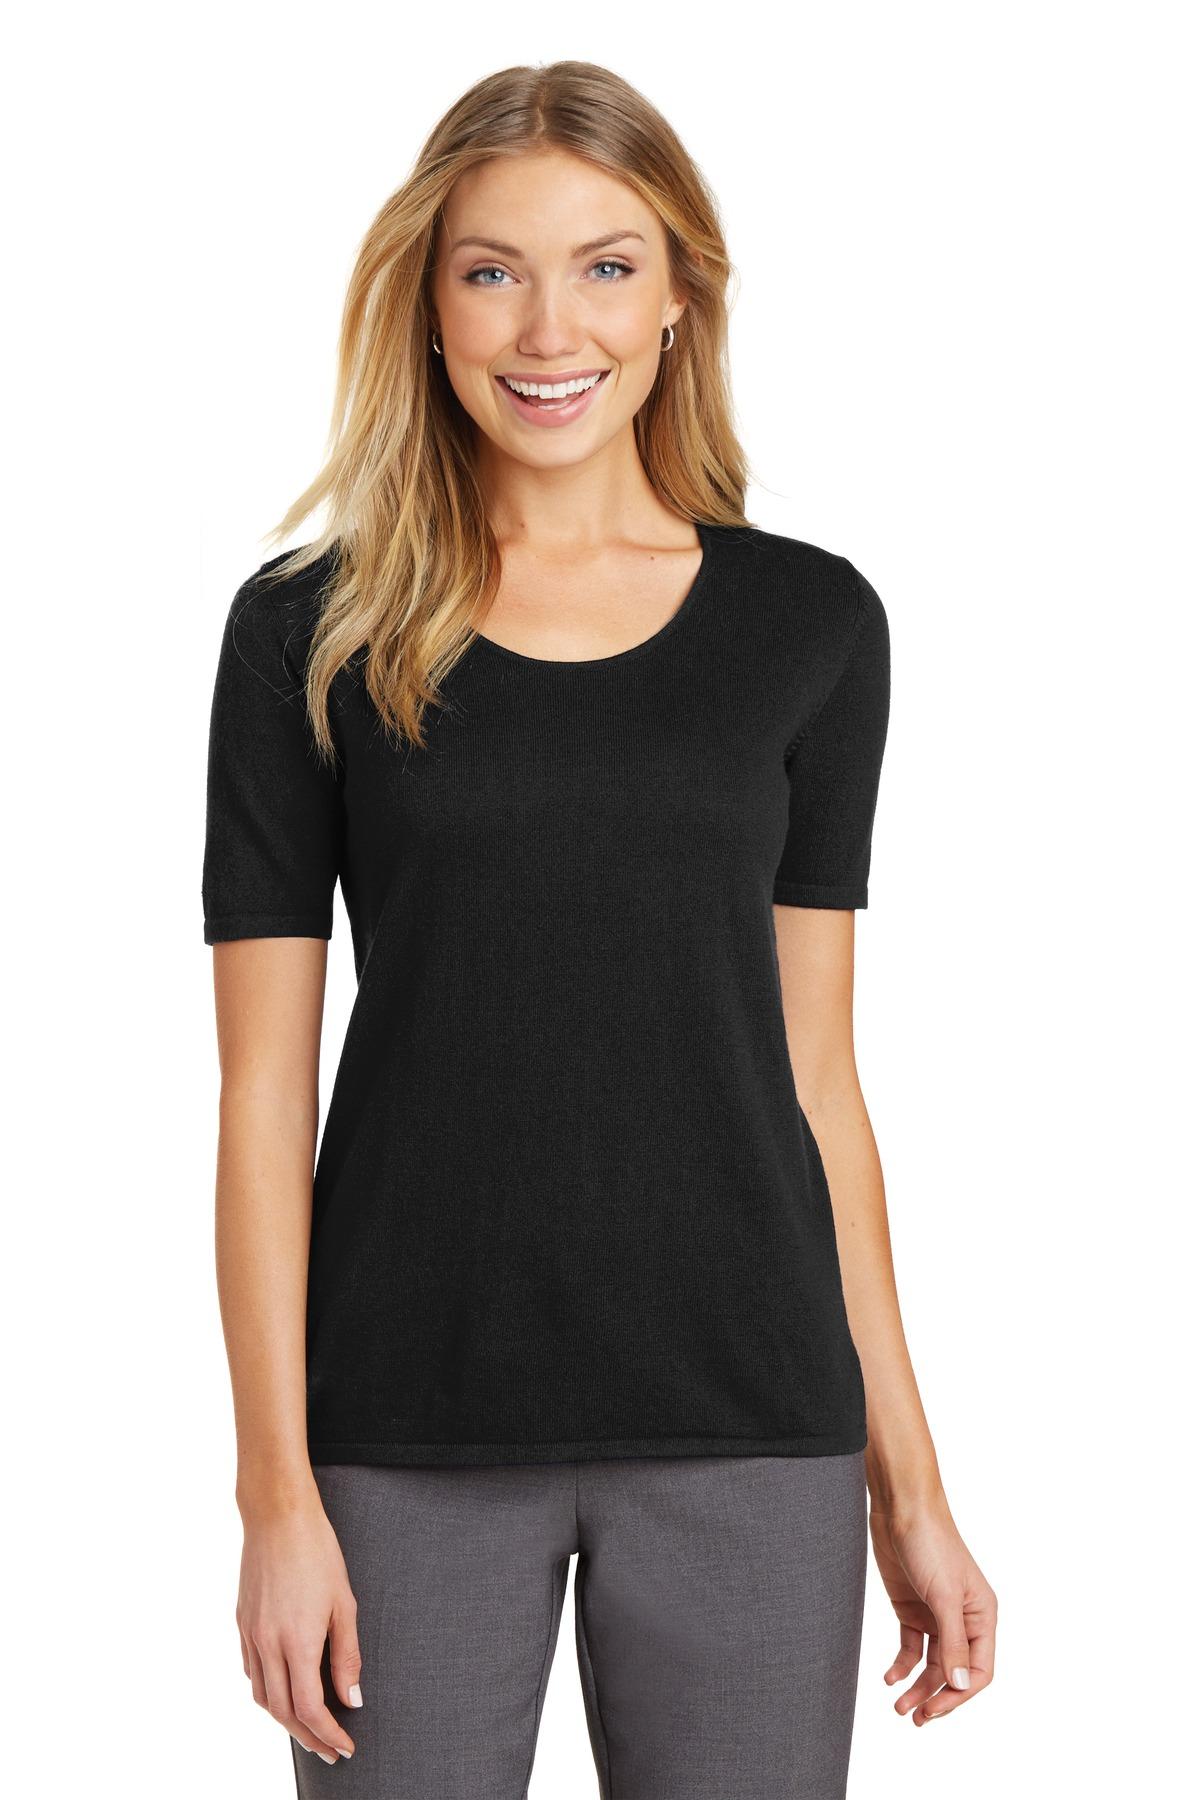 Port Authority LSW291 - Ladies Scoop Neck Sweater - Women's T-Shirts